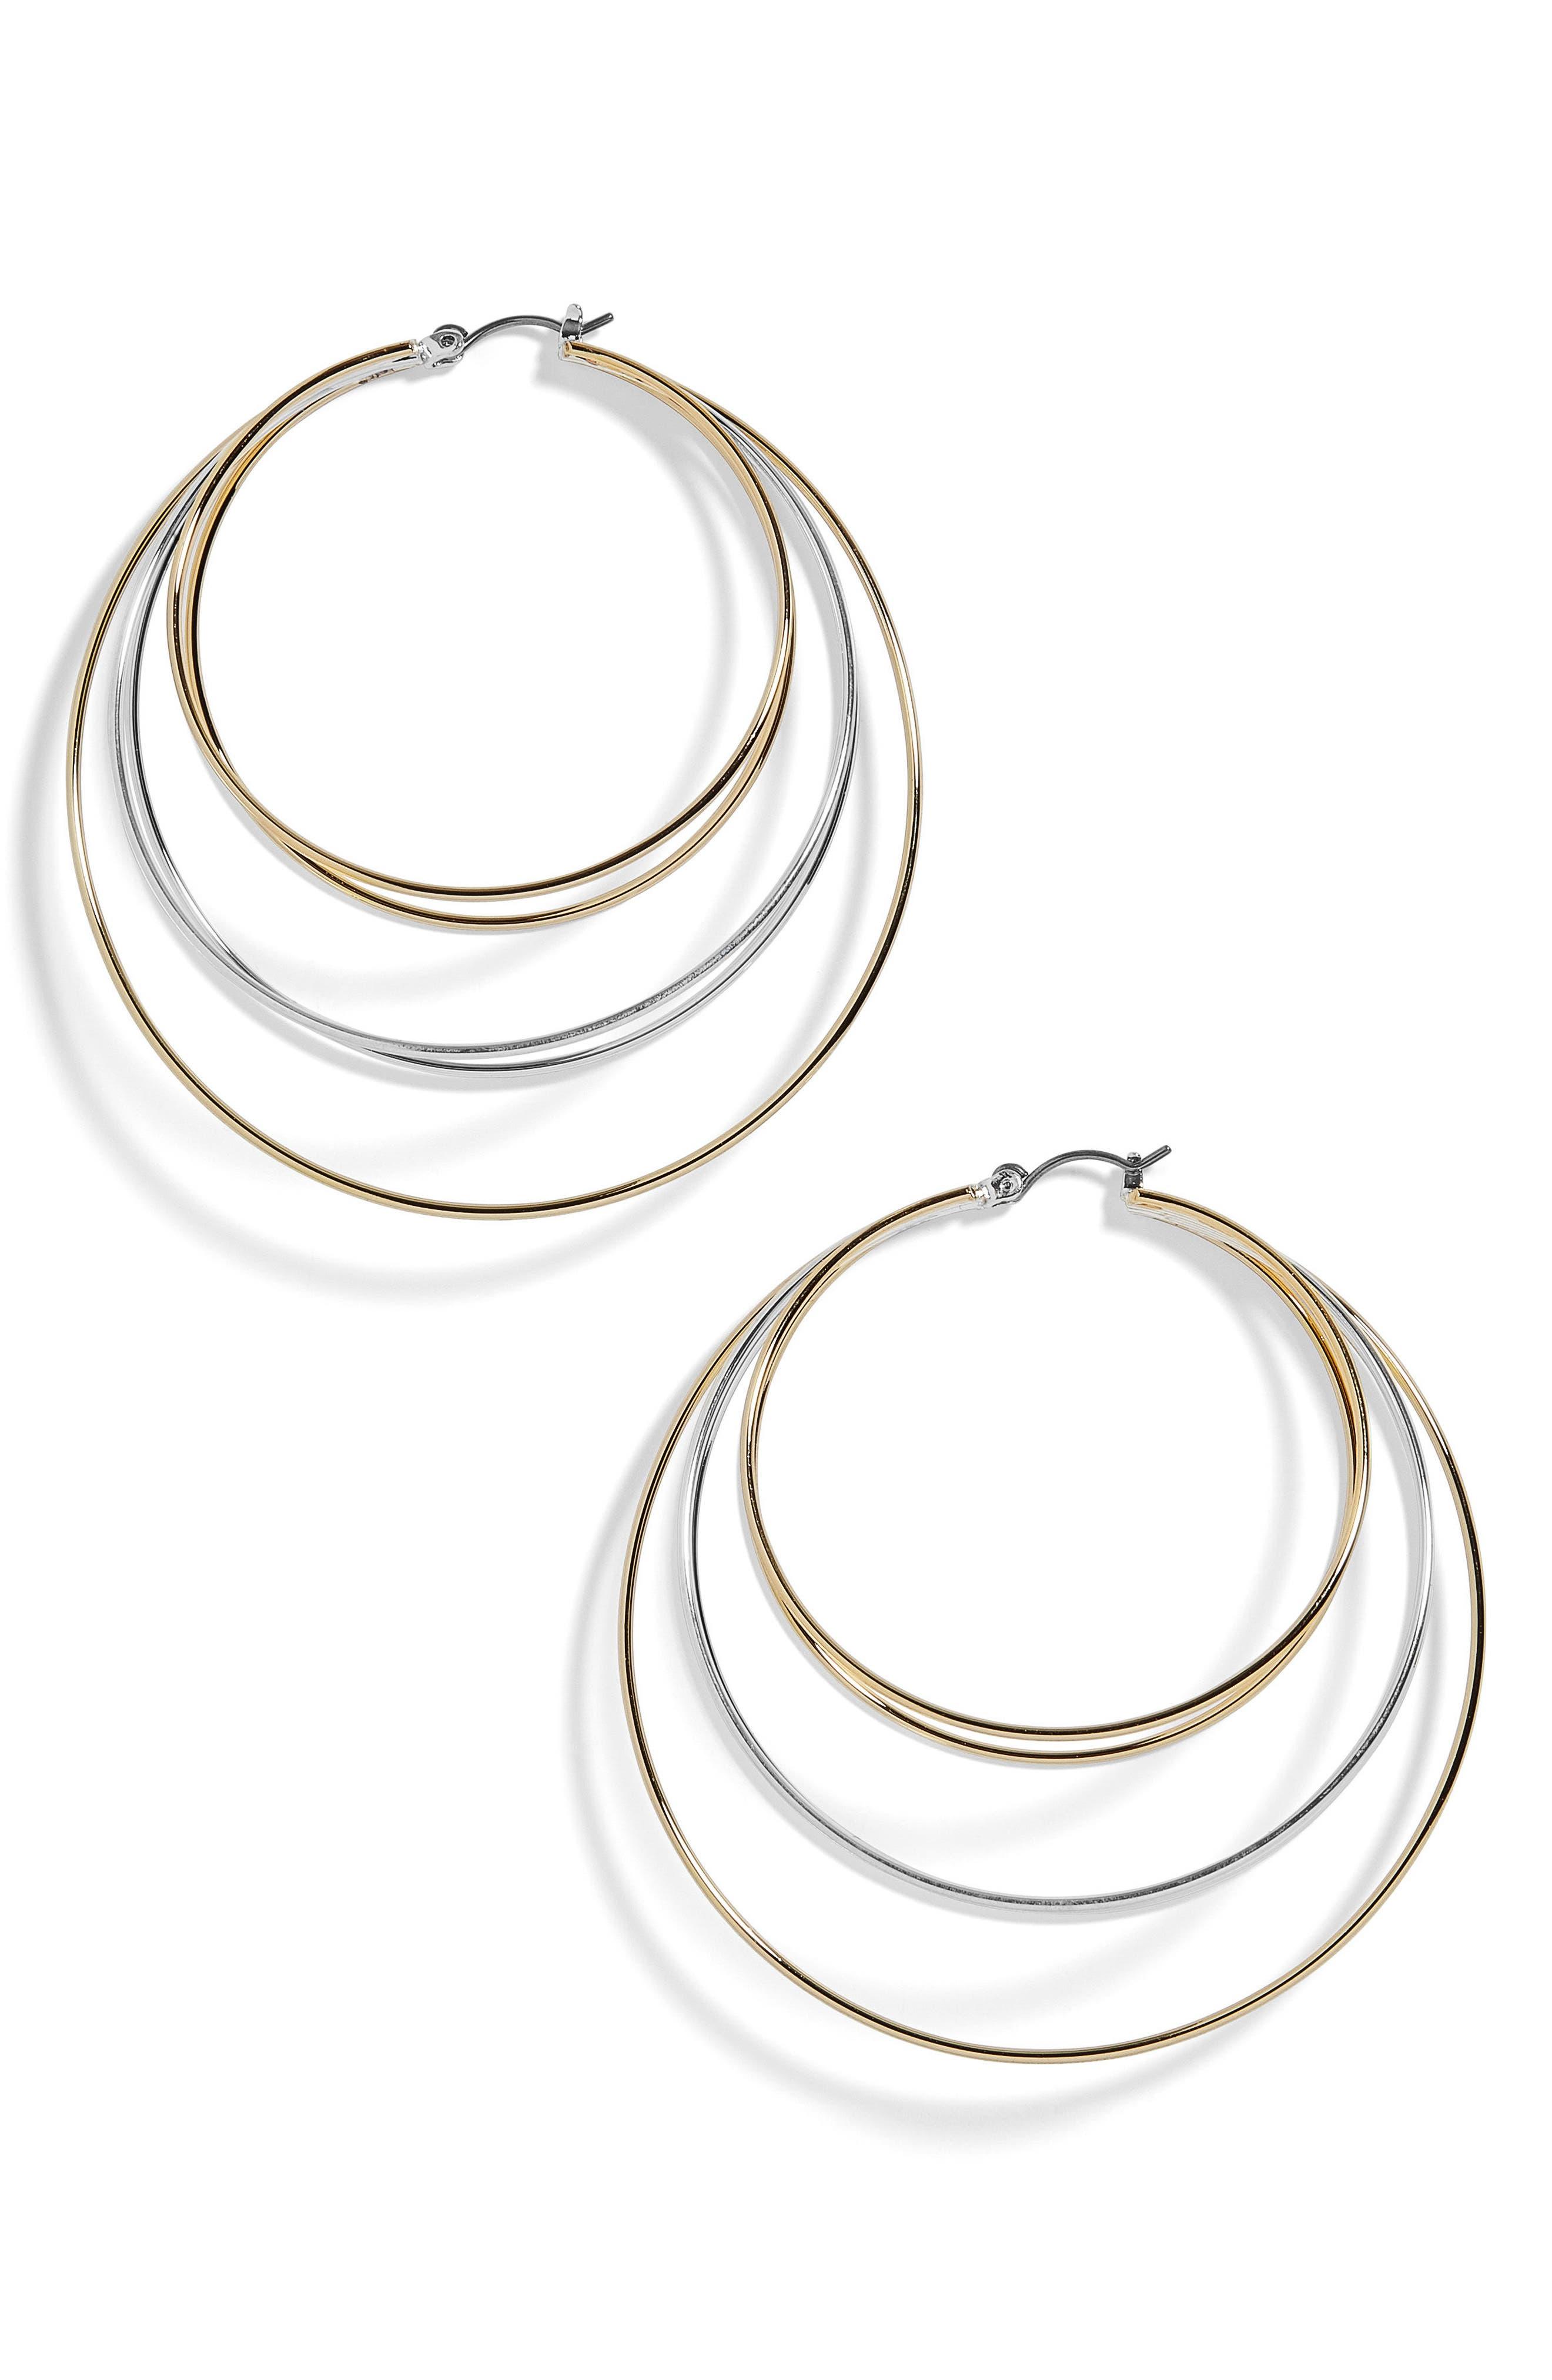 Rielle Mixed Metal Hoop Earrings,                             Main thumbnail 1, color,                             Silver/ Gold